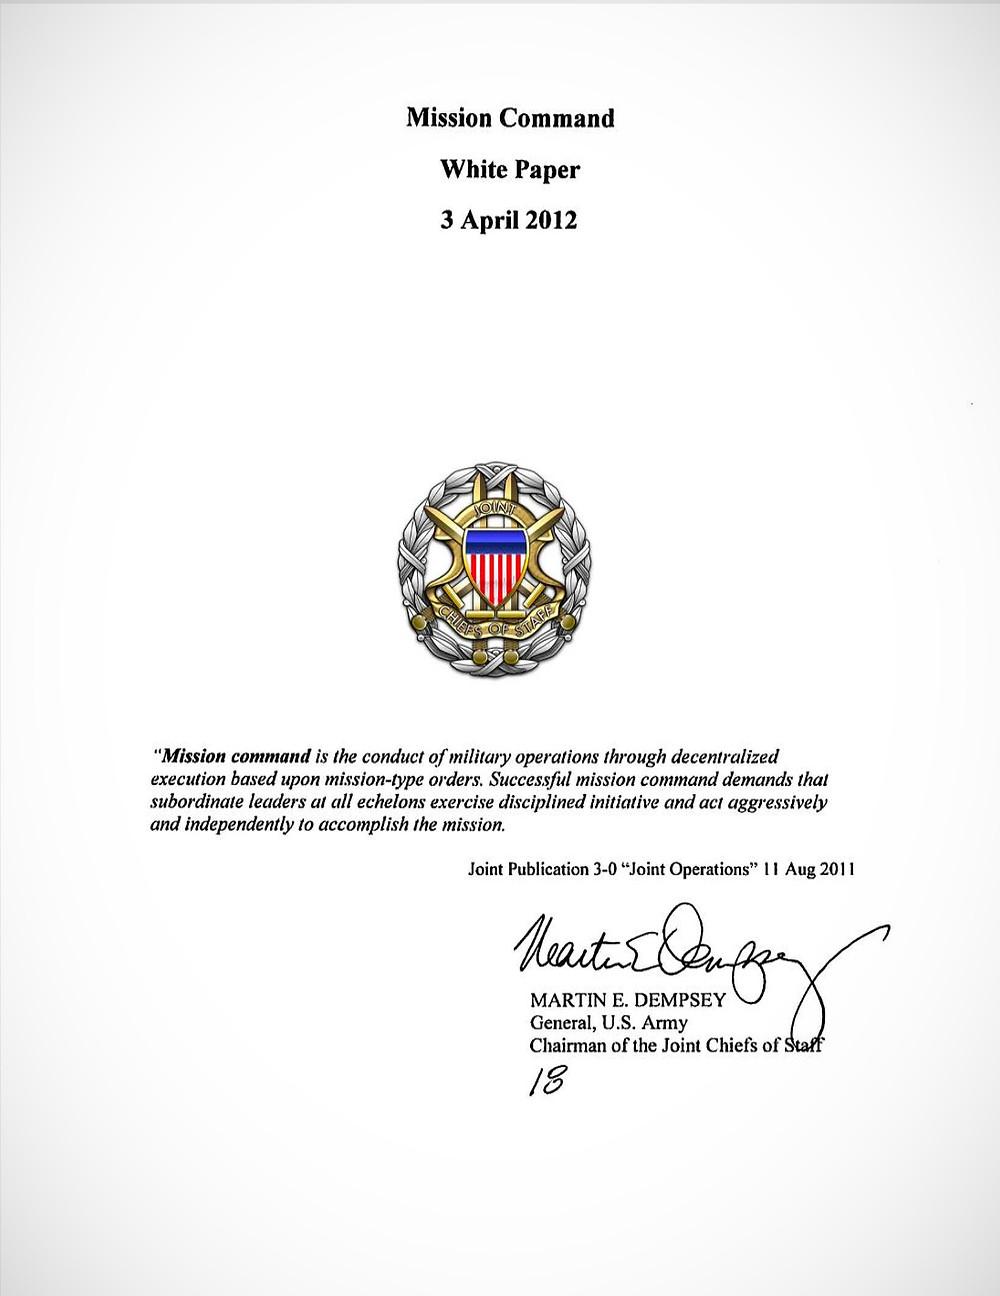 Mission Command White Paper - 3 April 2012